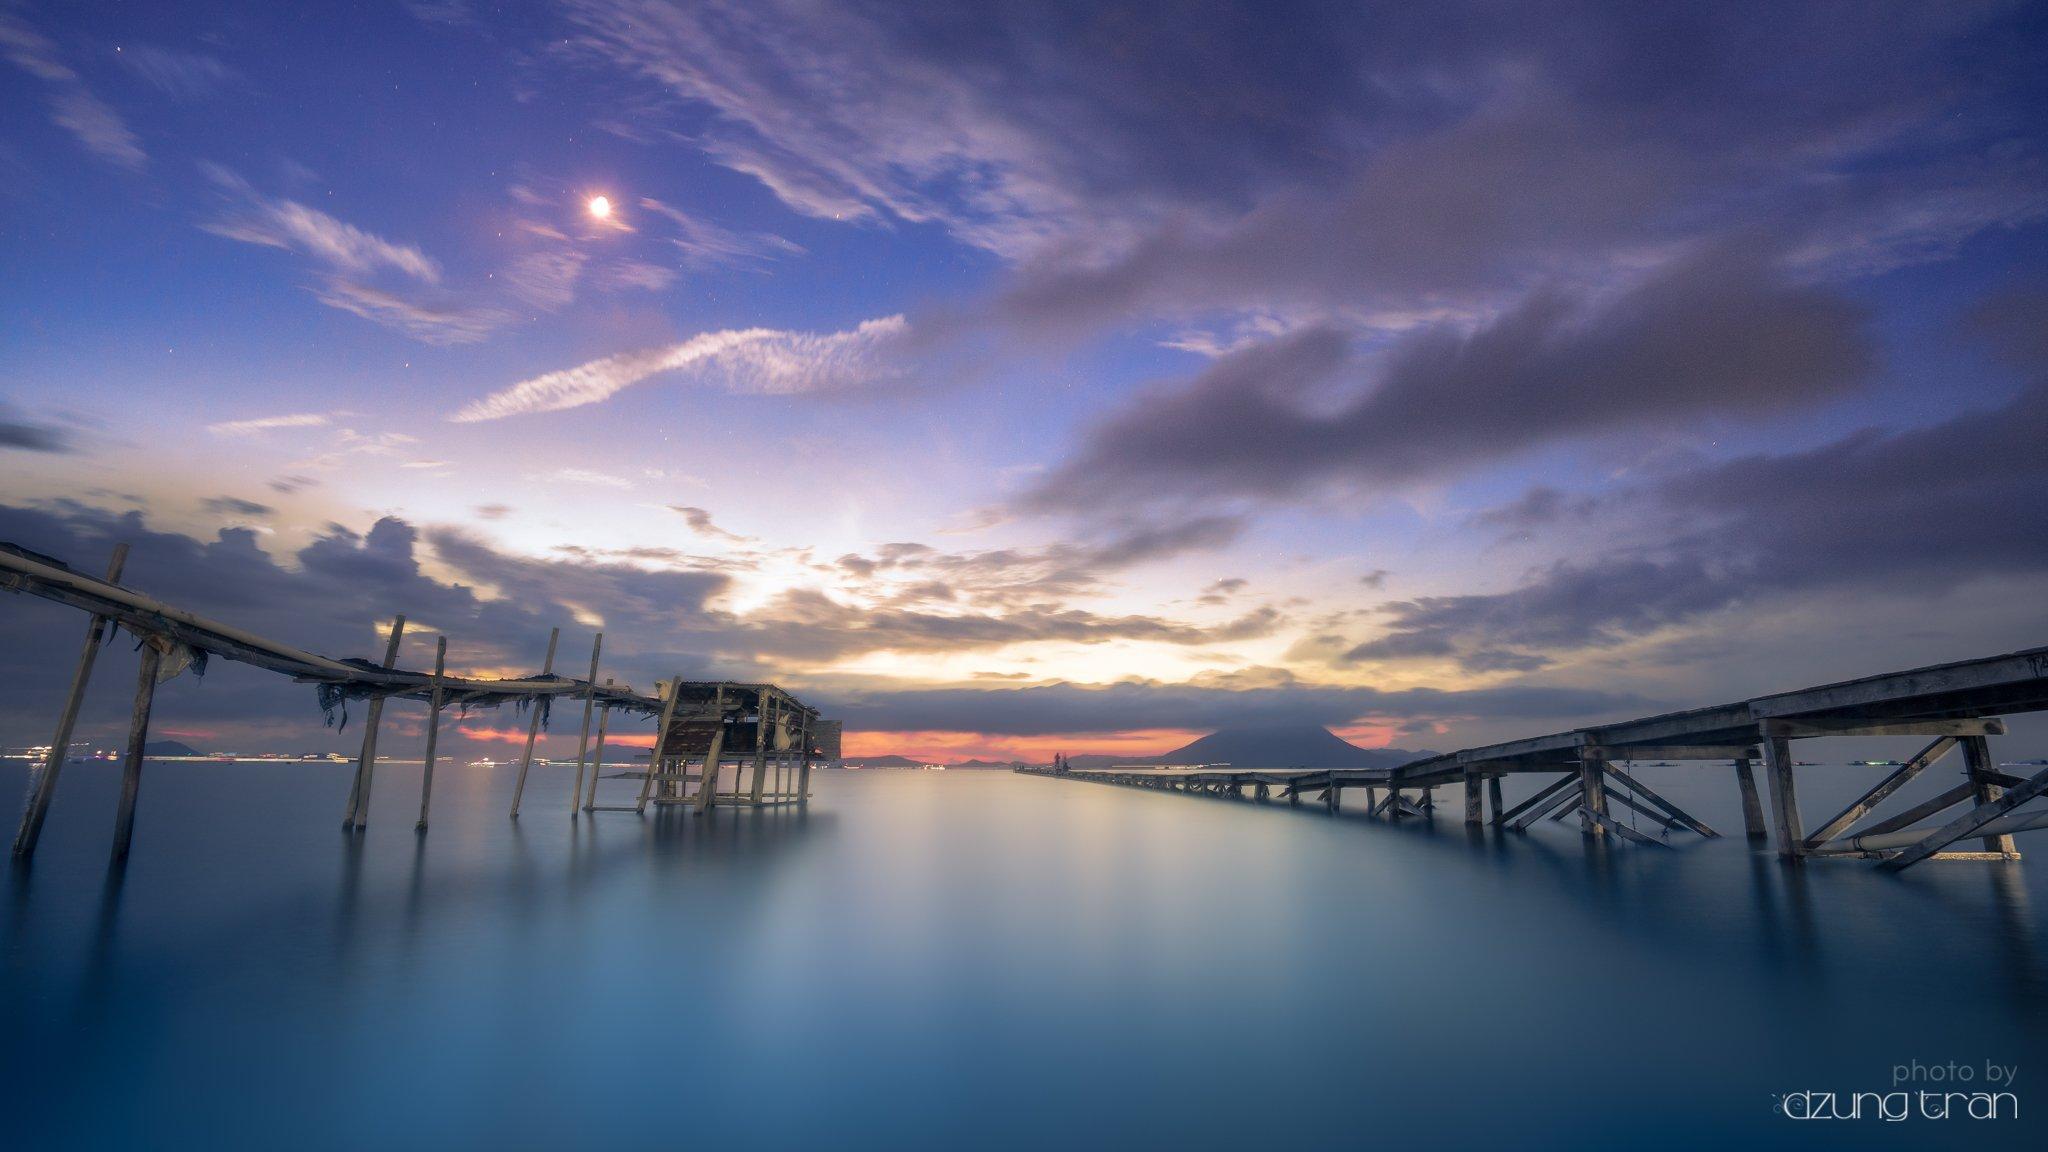 #seascape #smooth #longexposure #pearl #bridge, Dzung Tran